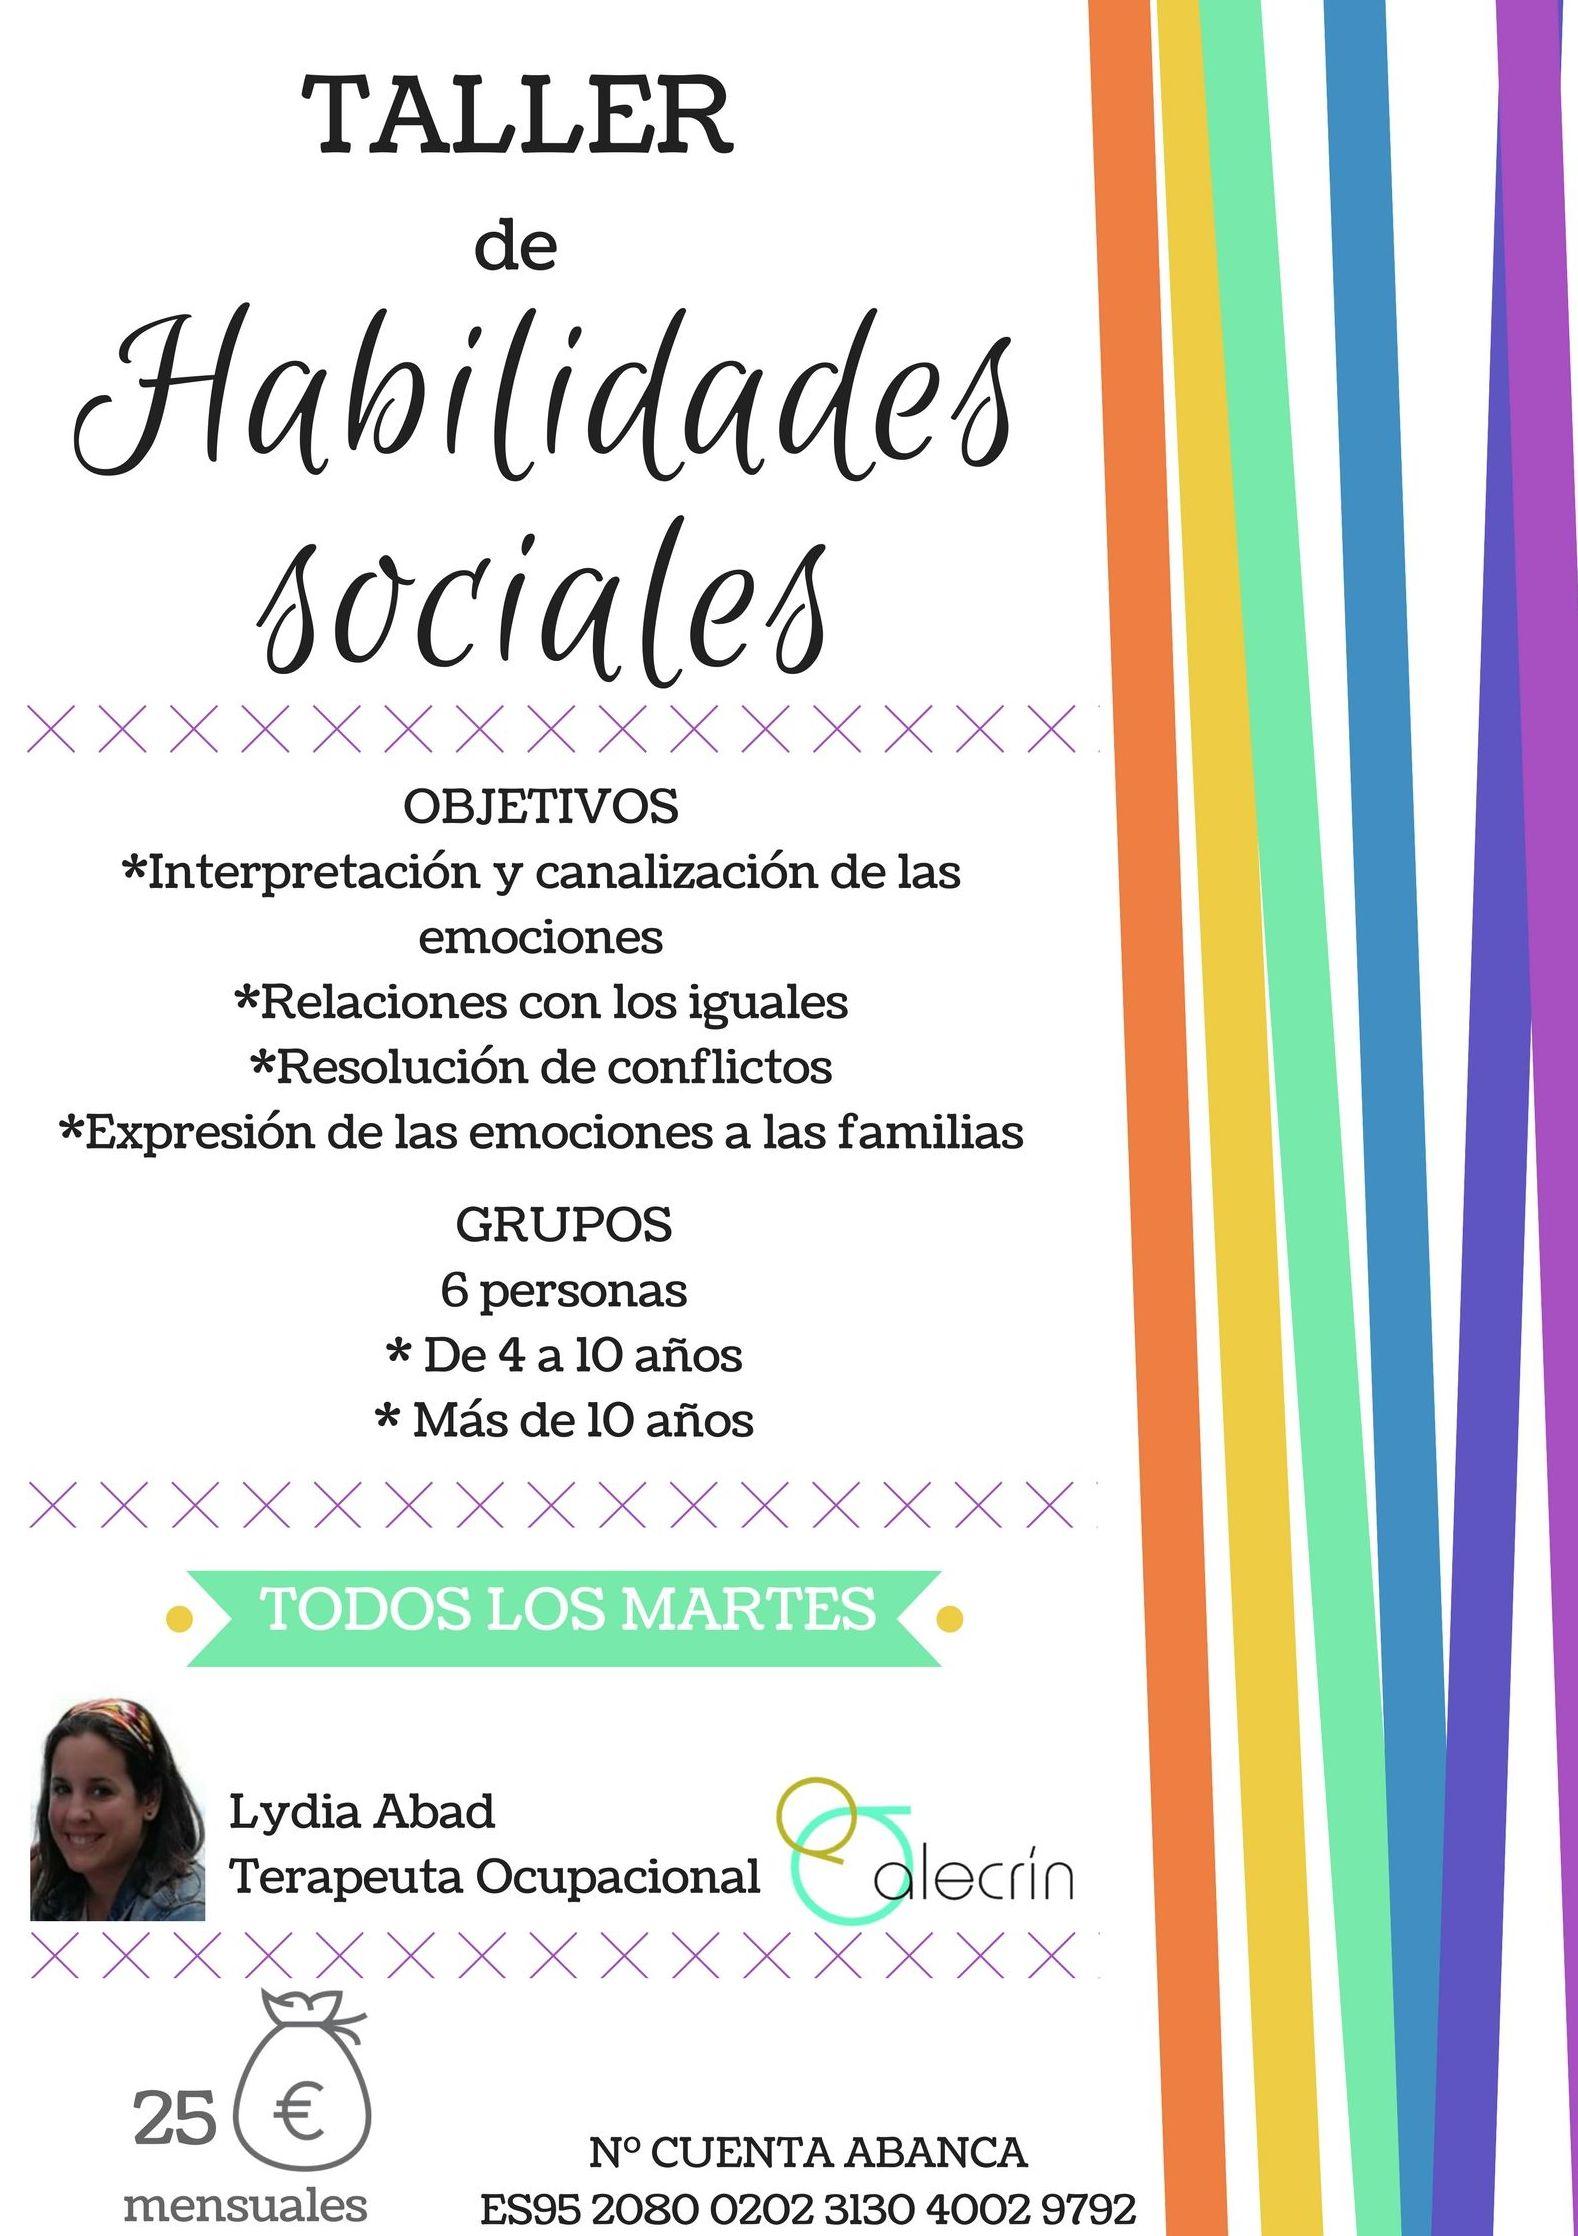 ¡Taller de Habilidades Sociales!